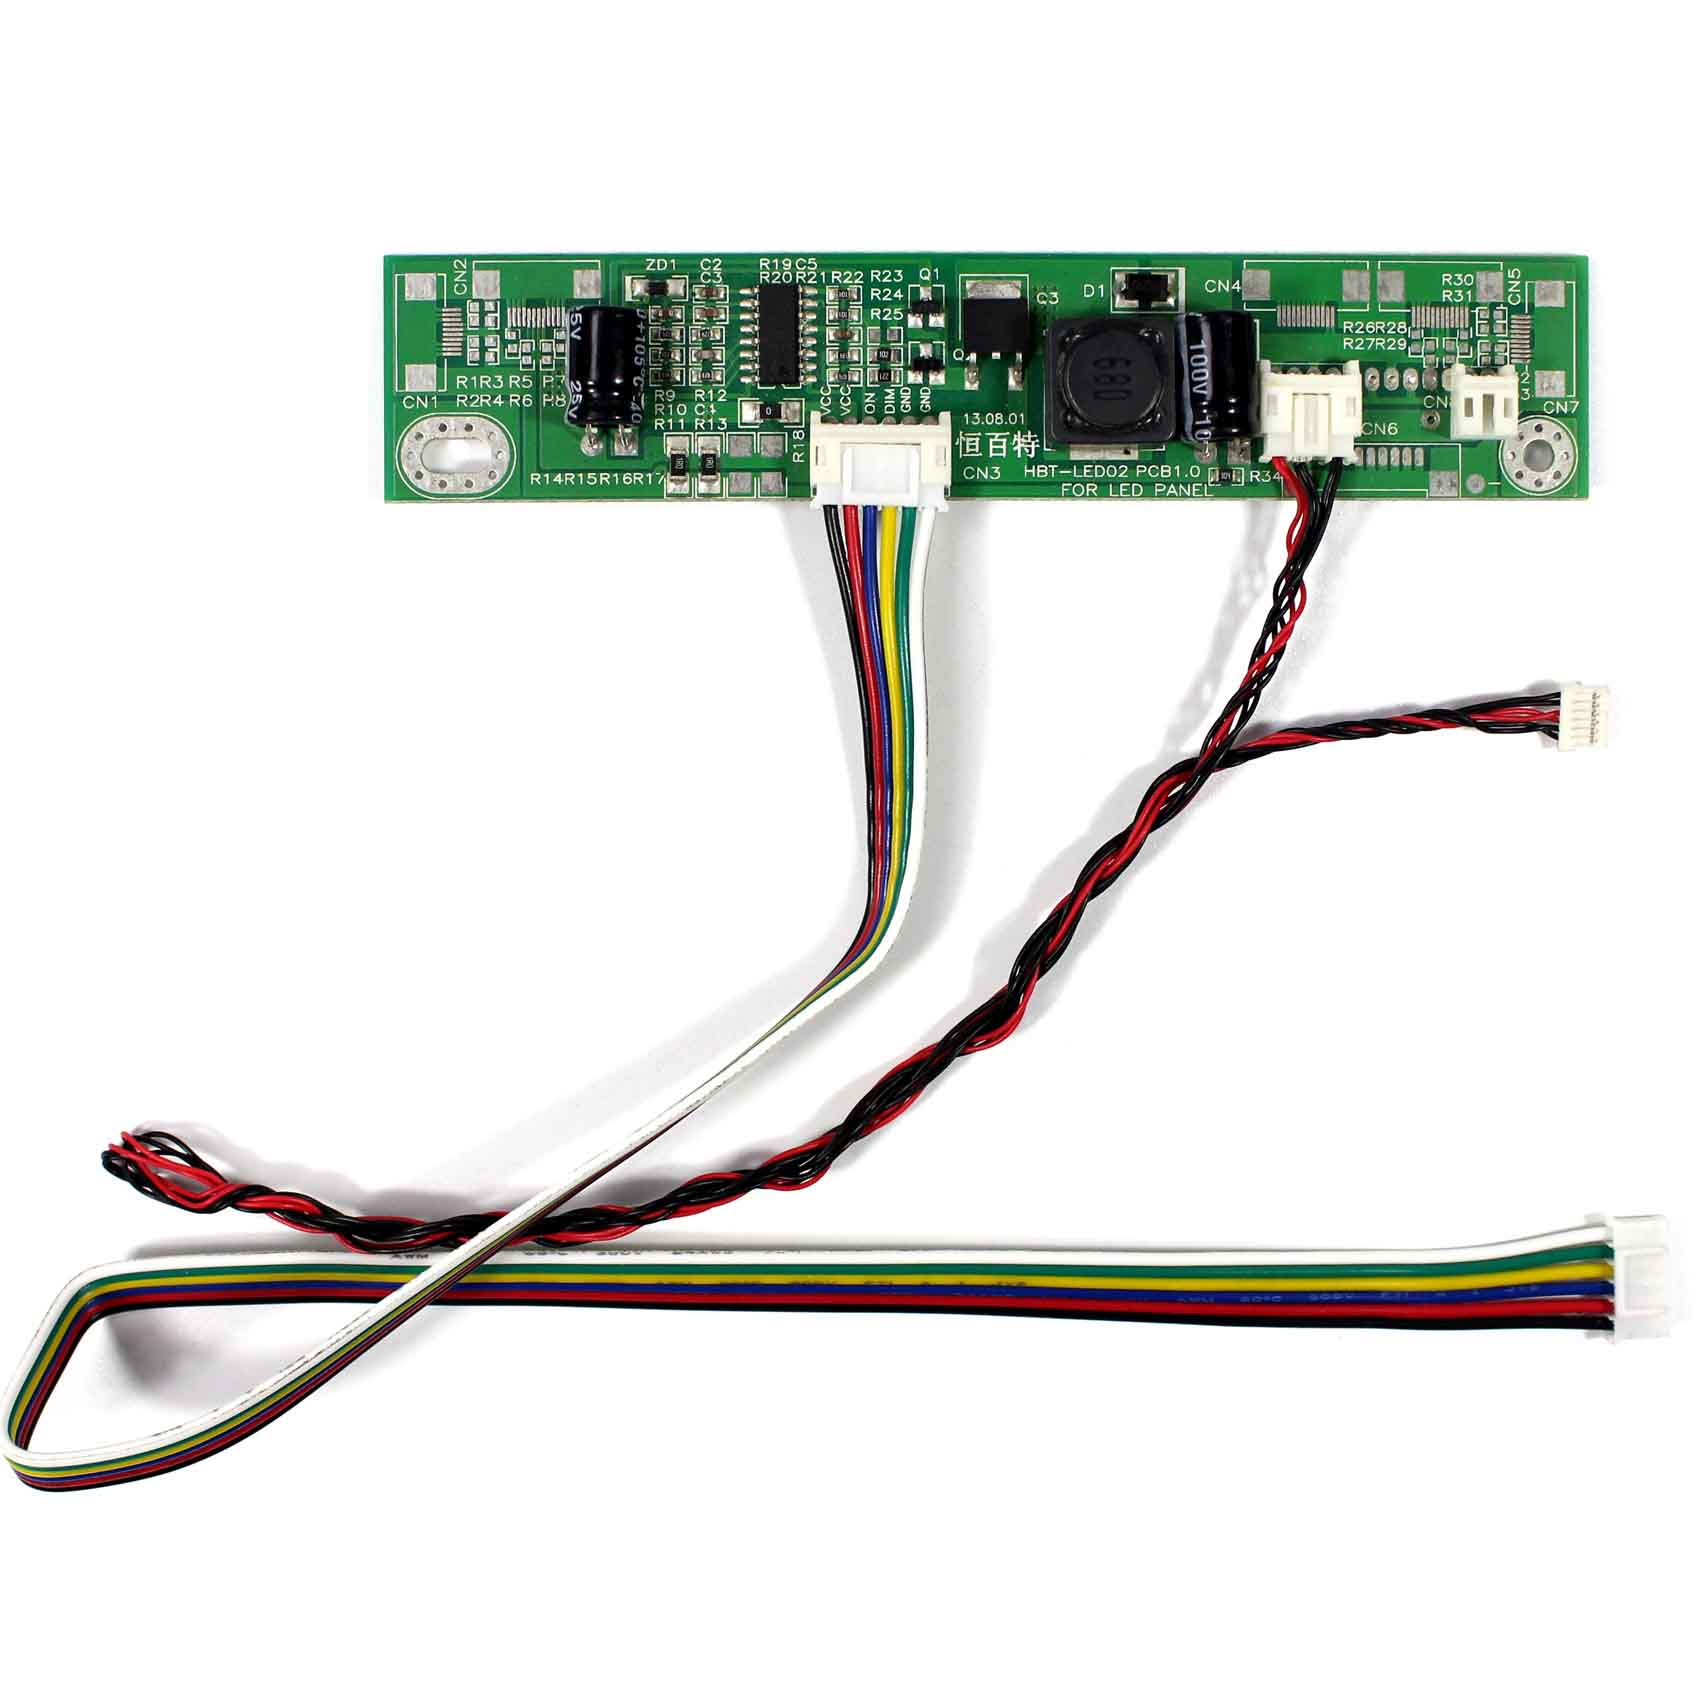 LED Inverter Board For LTM185AT04 M270HW02 M215HW01 VB M185BGE-L22 LCD VS632B-1